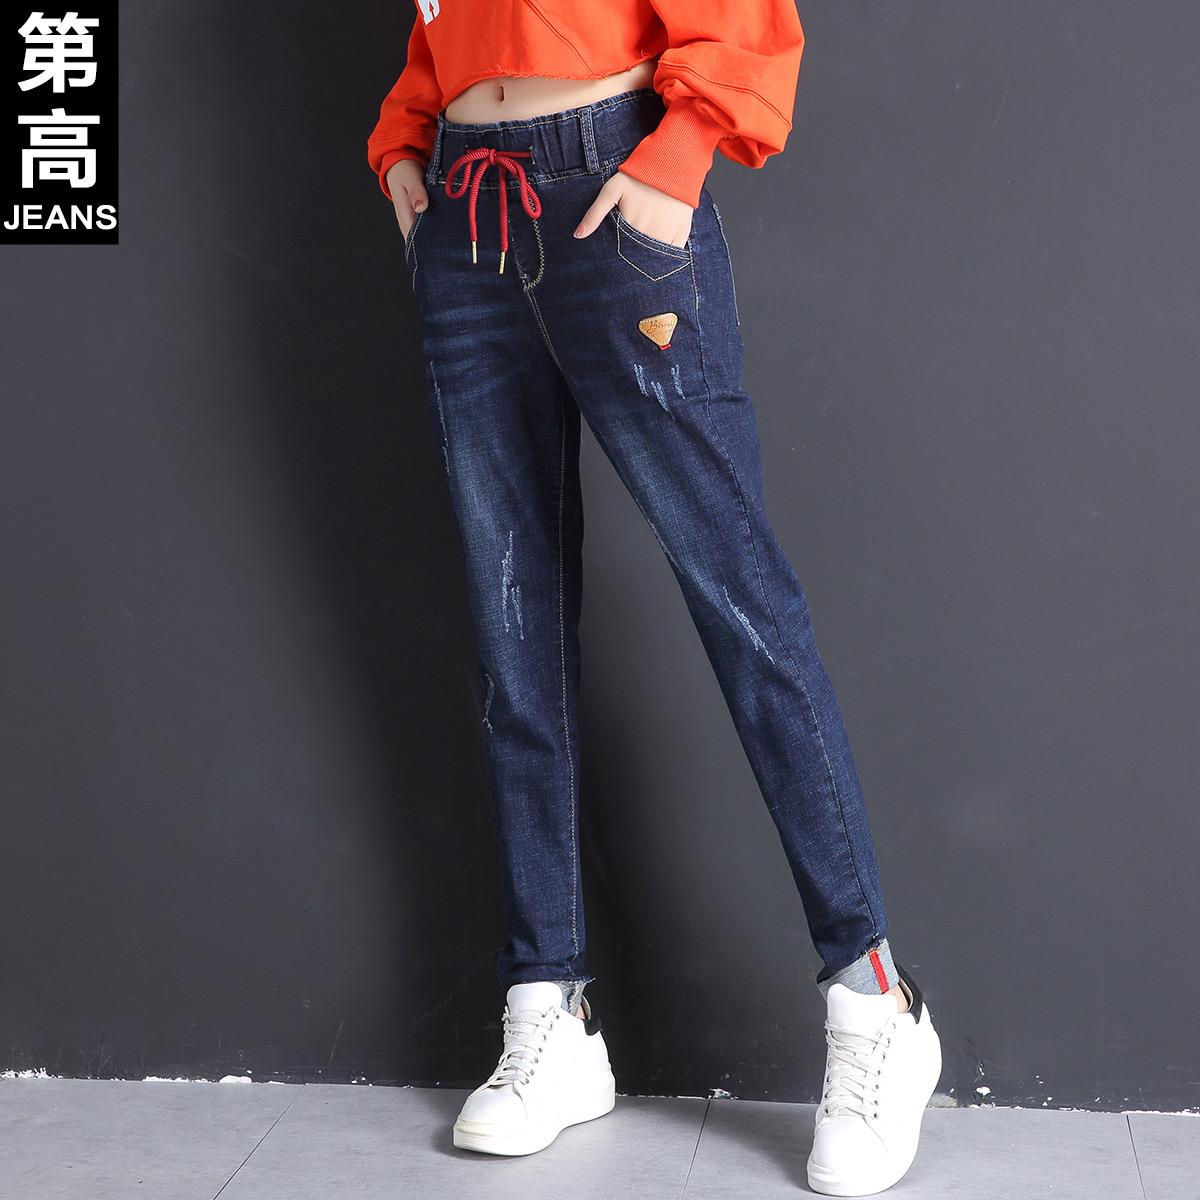 Flash Sale QIUESSII Korea Fashion Style perempuan Bandwidth pinggang celana panjang celana jeans (Biru)